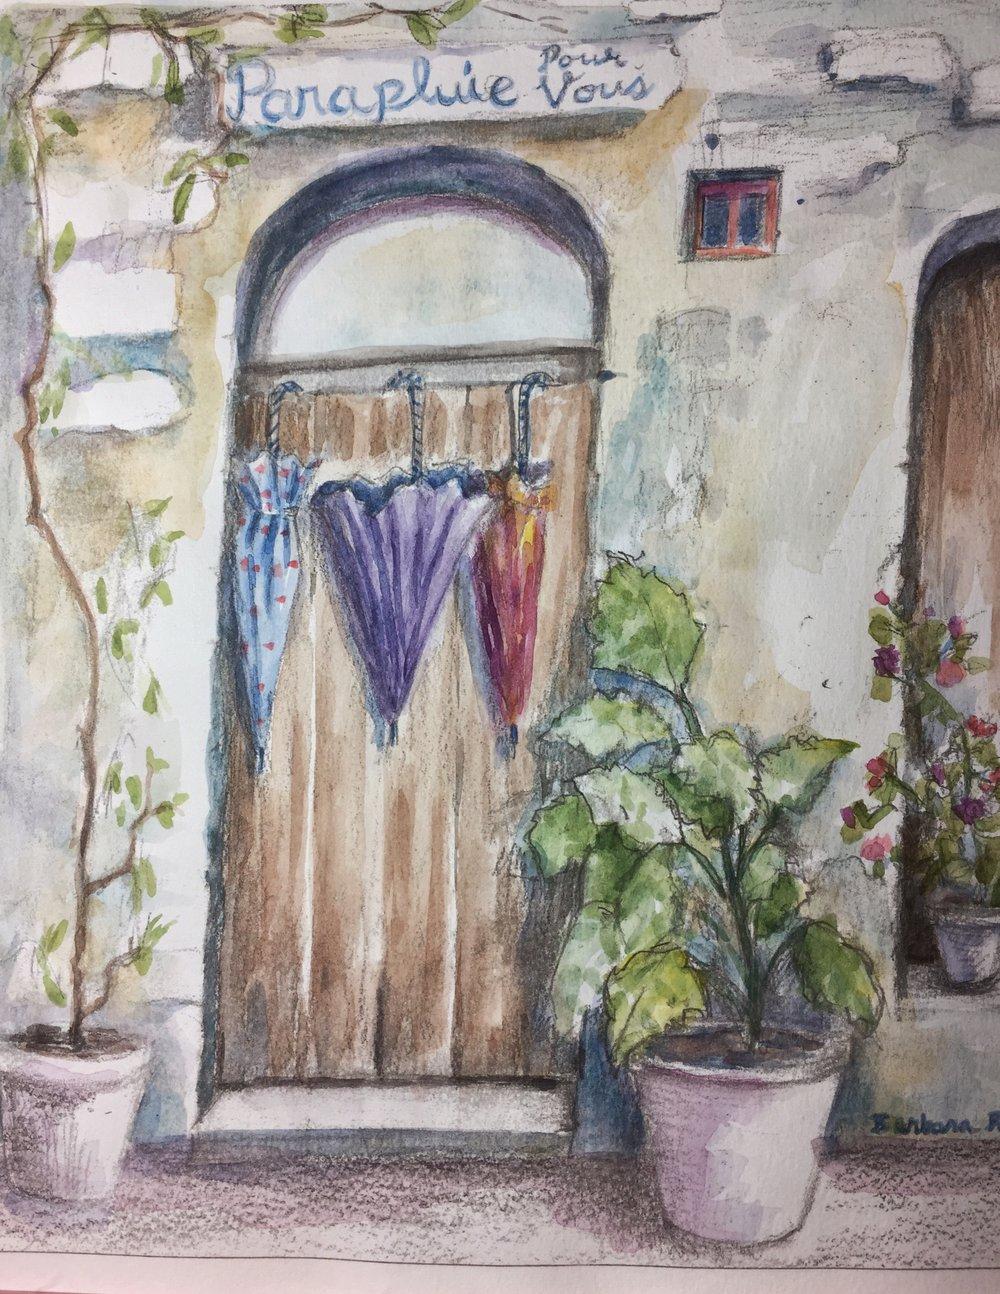 Three Umbrellas in Provence